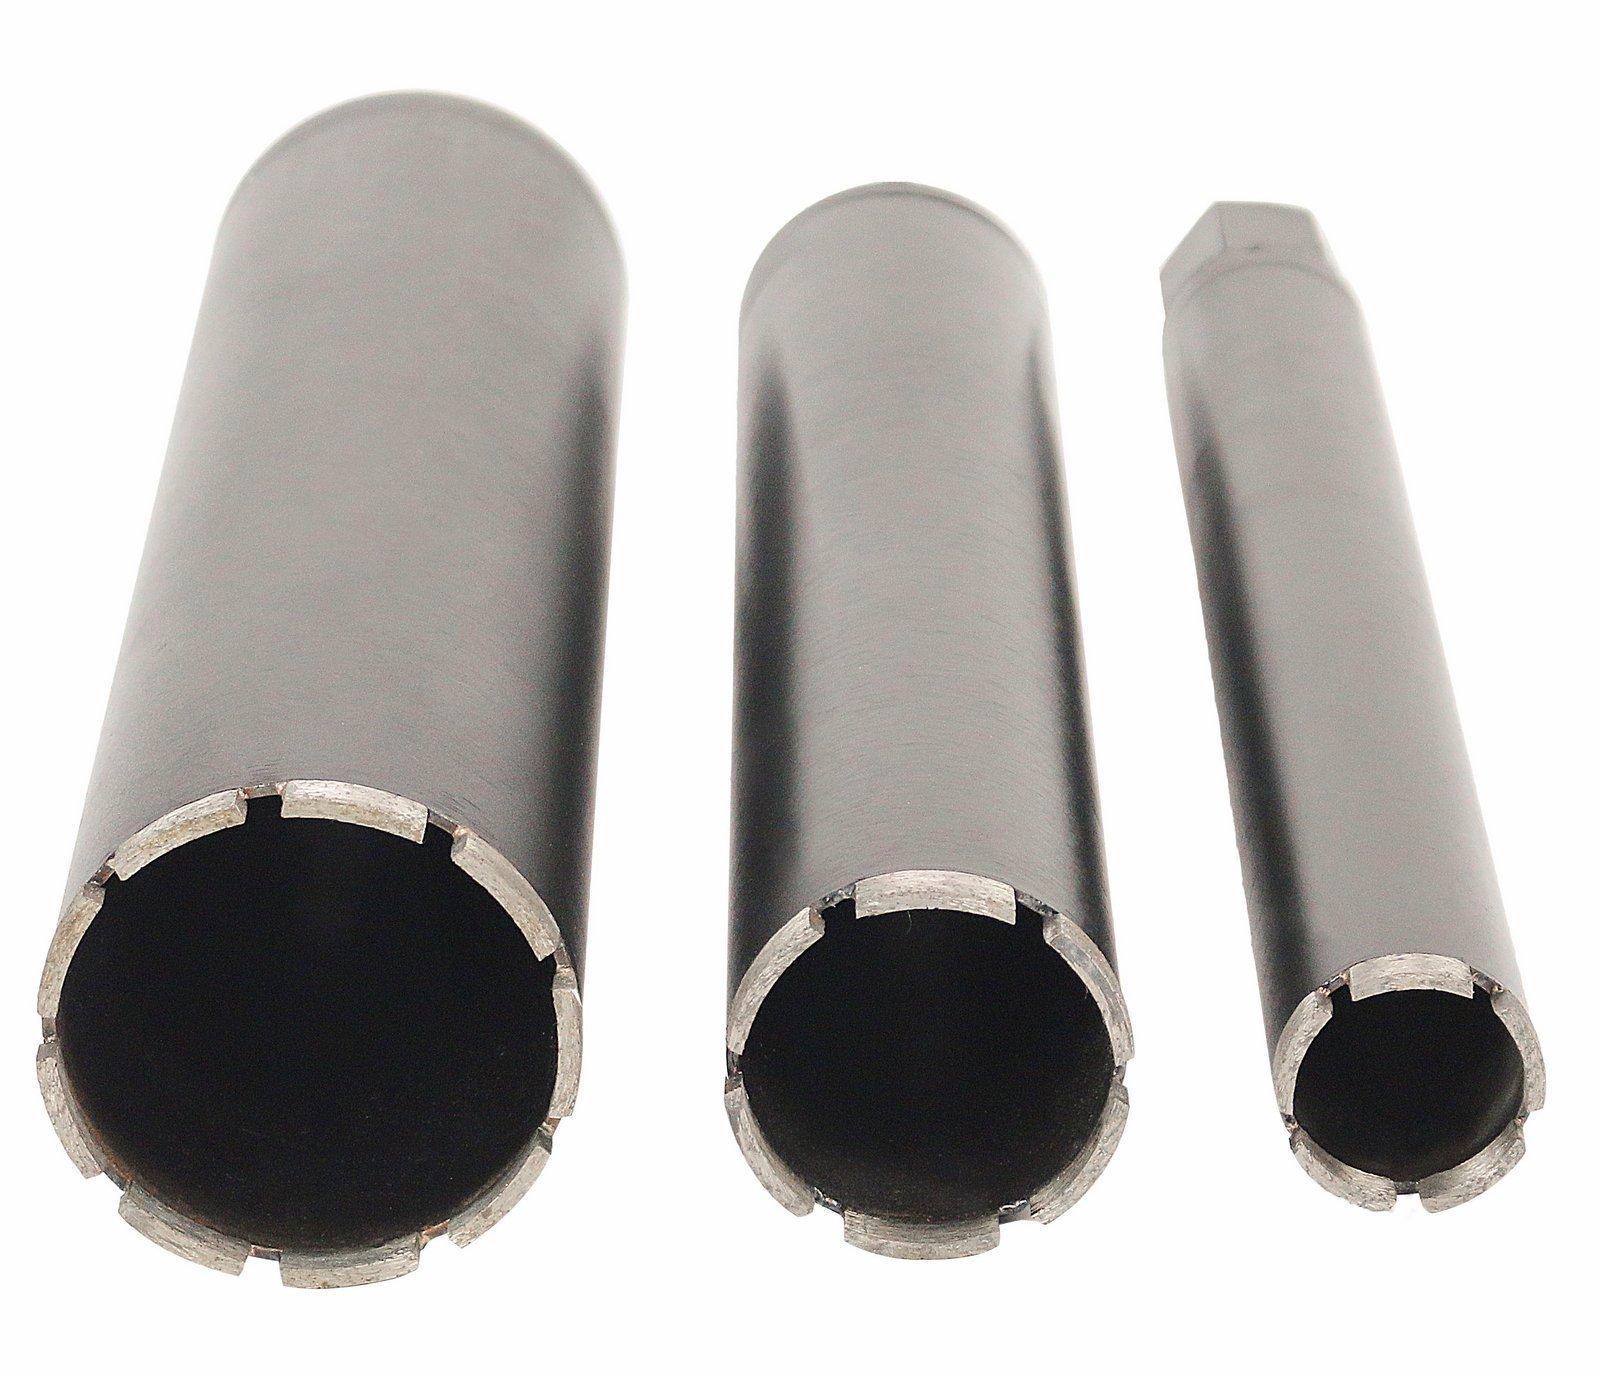 Steel Dragon Tools 3-Piece 2''-4'' Wet Laser Welded Diamond Core Drill Bits fit Hilti Milwaukee Rigs